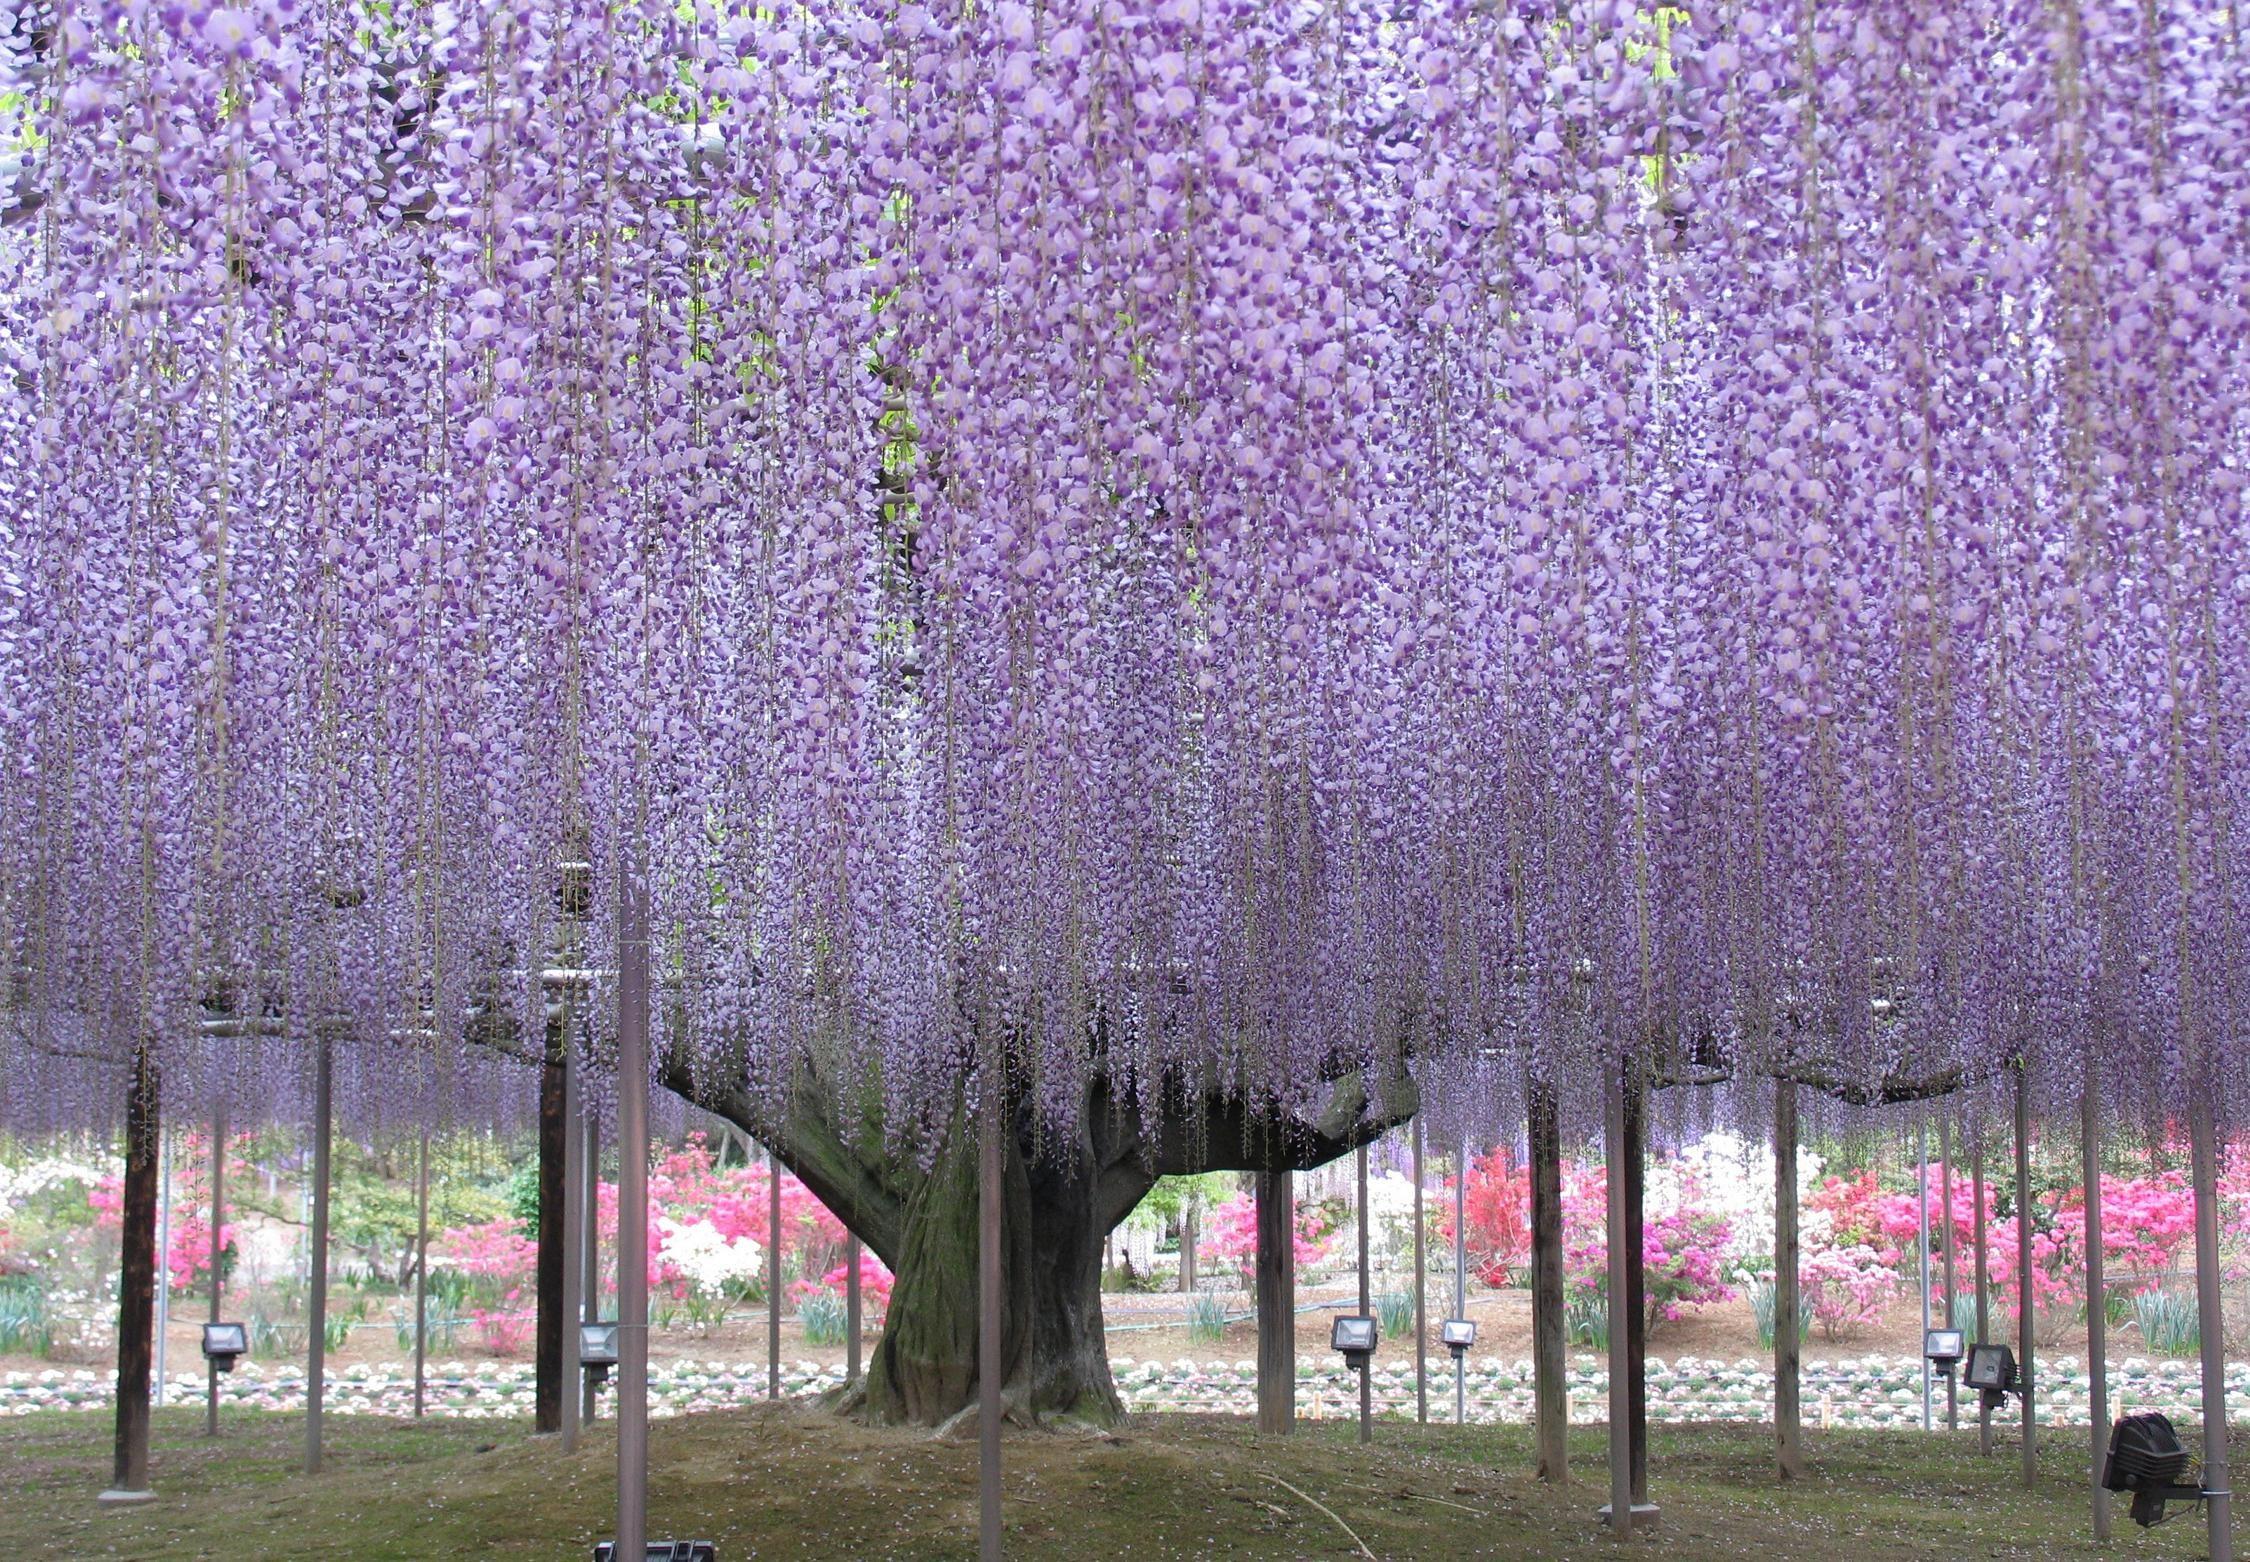 Giant Wisteria In Japan S Ashikaga Flower Park R Pics Japan Flower Garden Wisteria Tree Wisteria